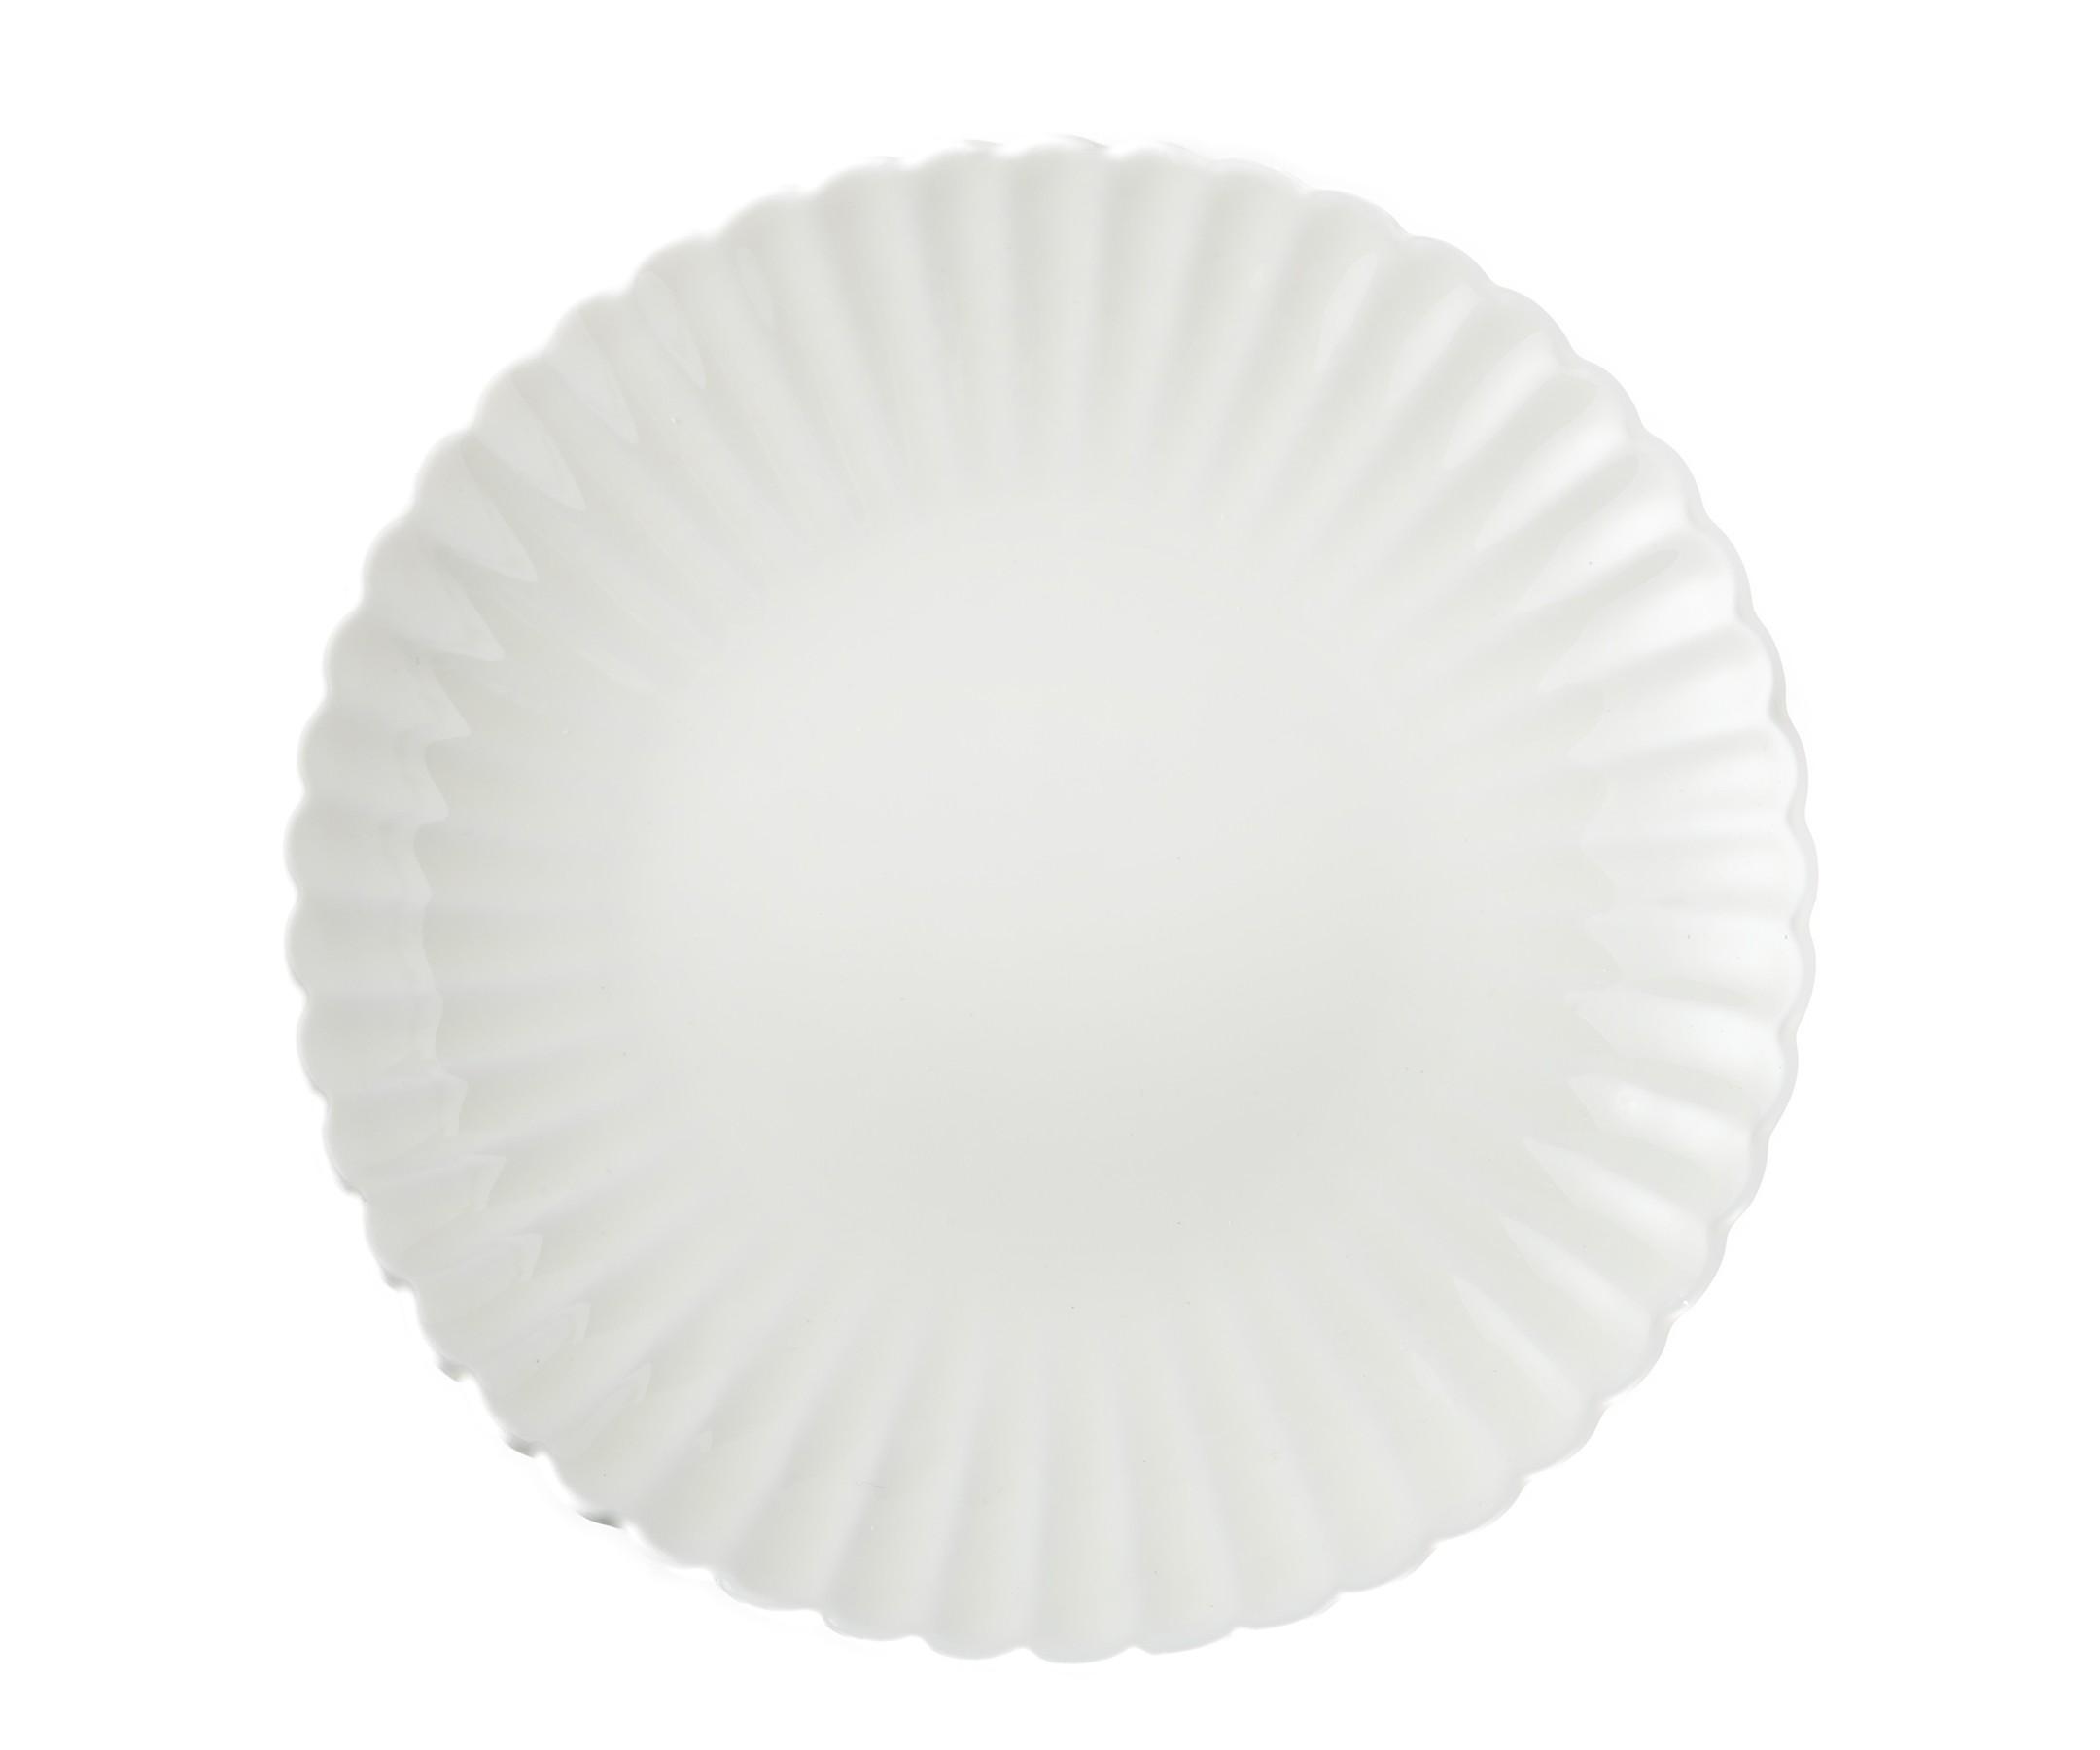 Тарелка CoralДекоративные тарелки<br><br><br>Material: Керамика<br>Length см: None<br>Width см: None<br>Height см: 2<br>Diameter см: 20